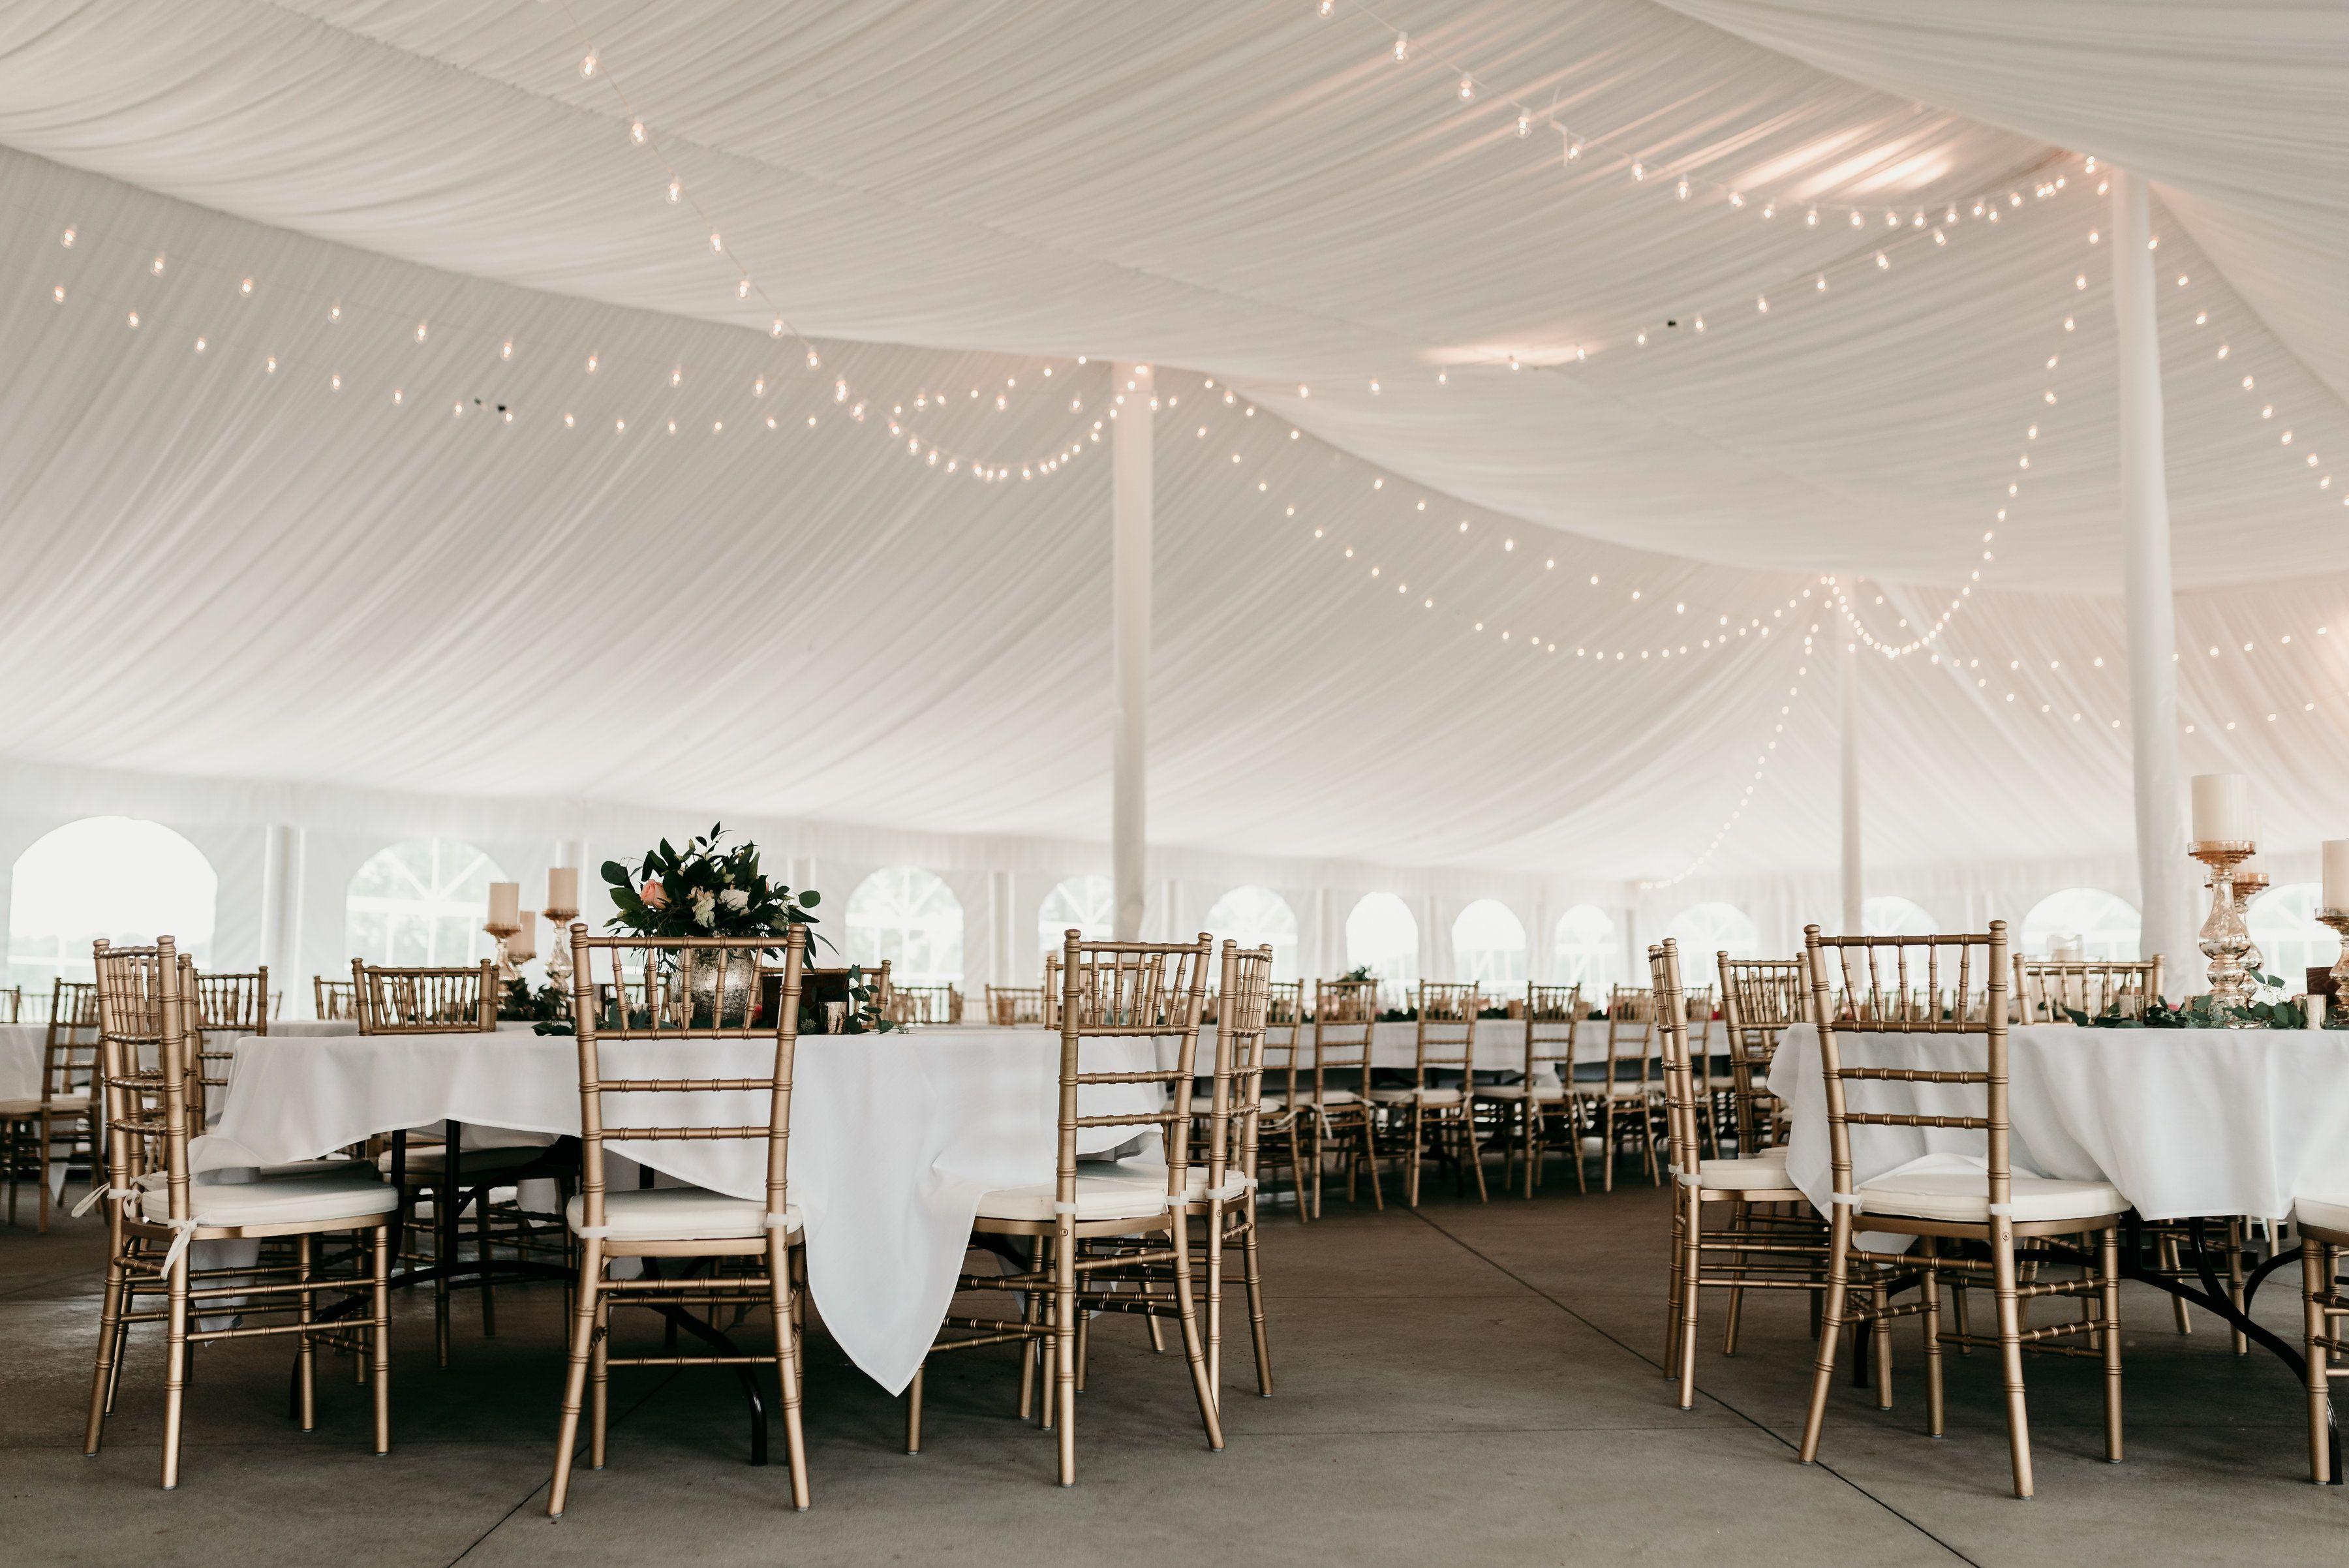 Outdoor tent wedding decor outdoor wedding venues